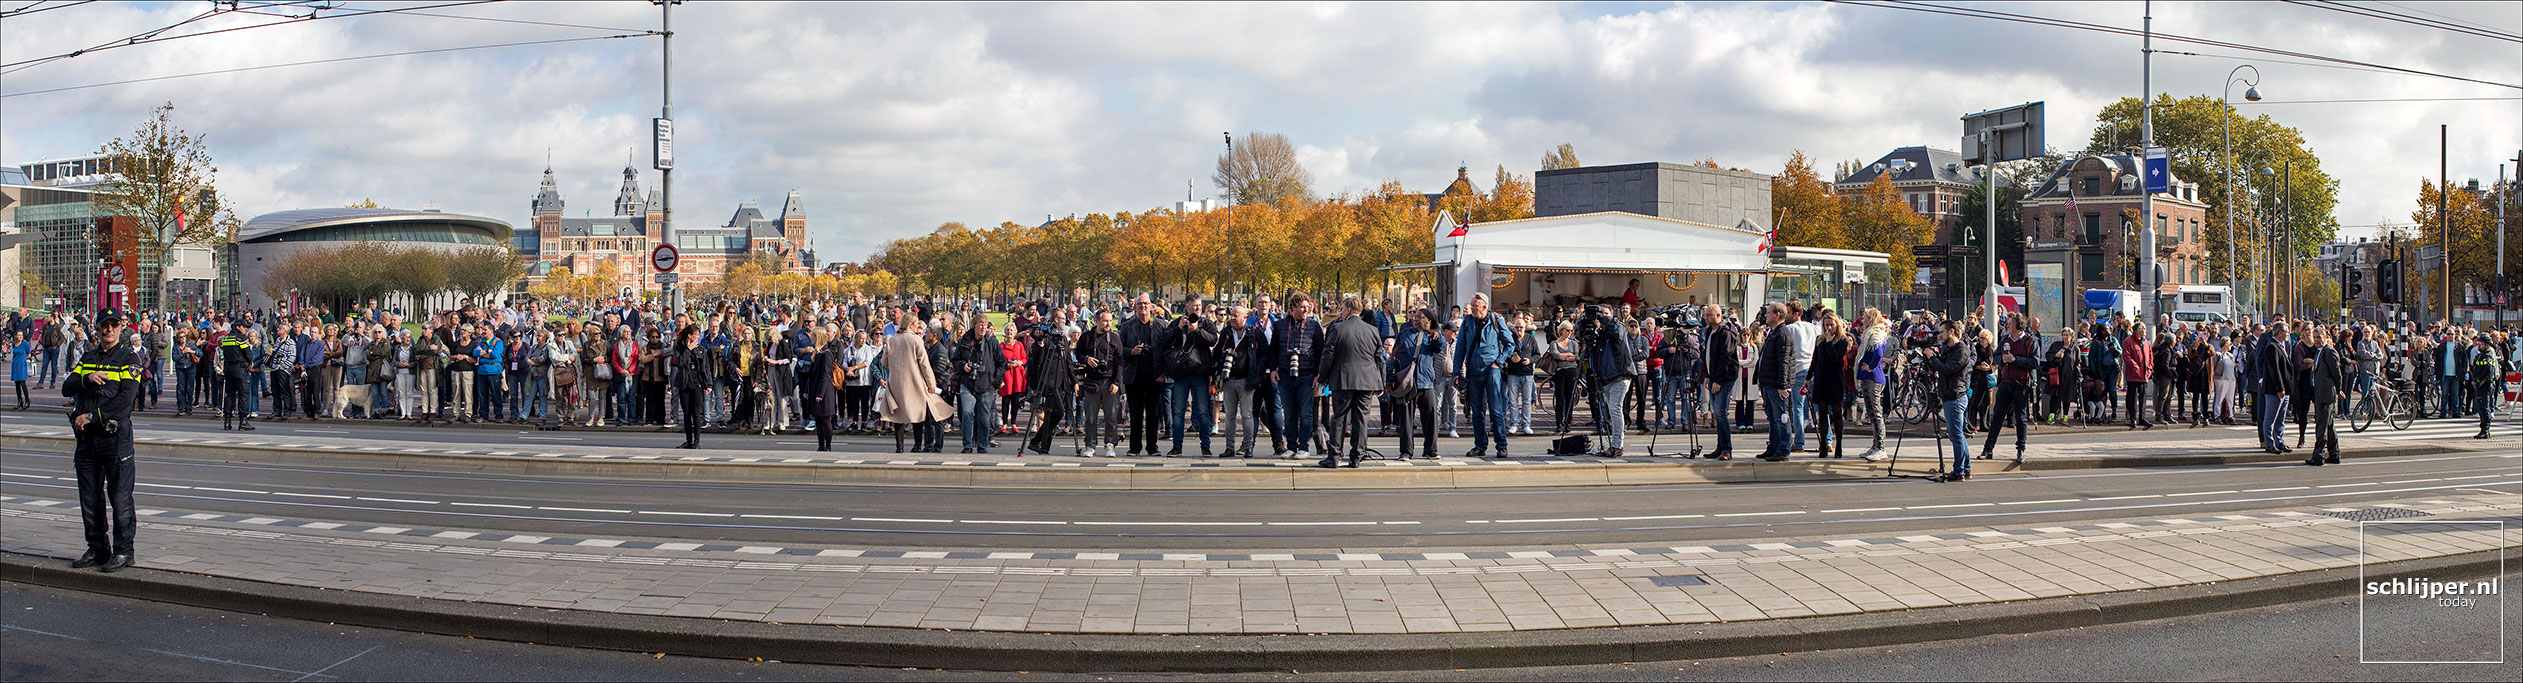 Nederland, Amsterdam, 14 oktober 2017